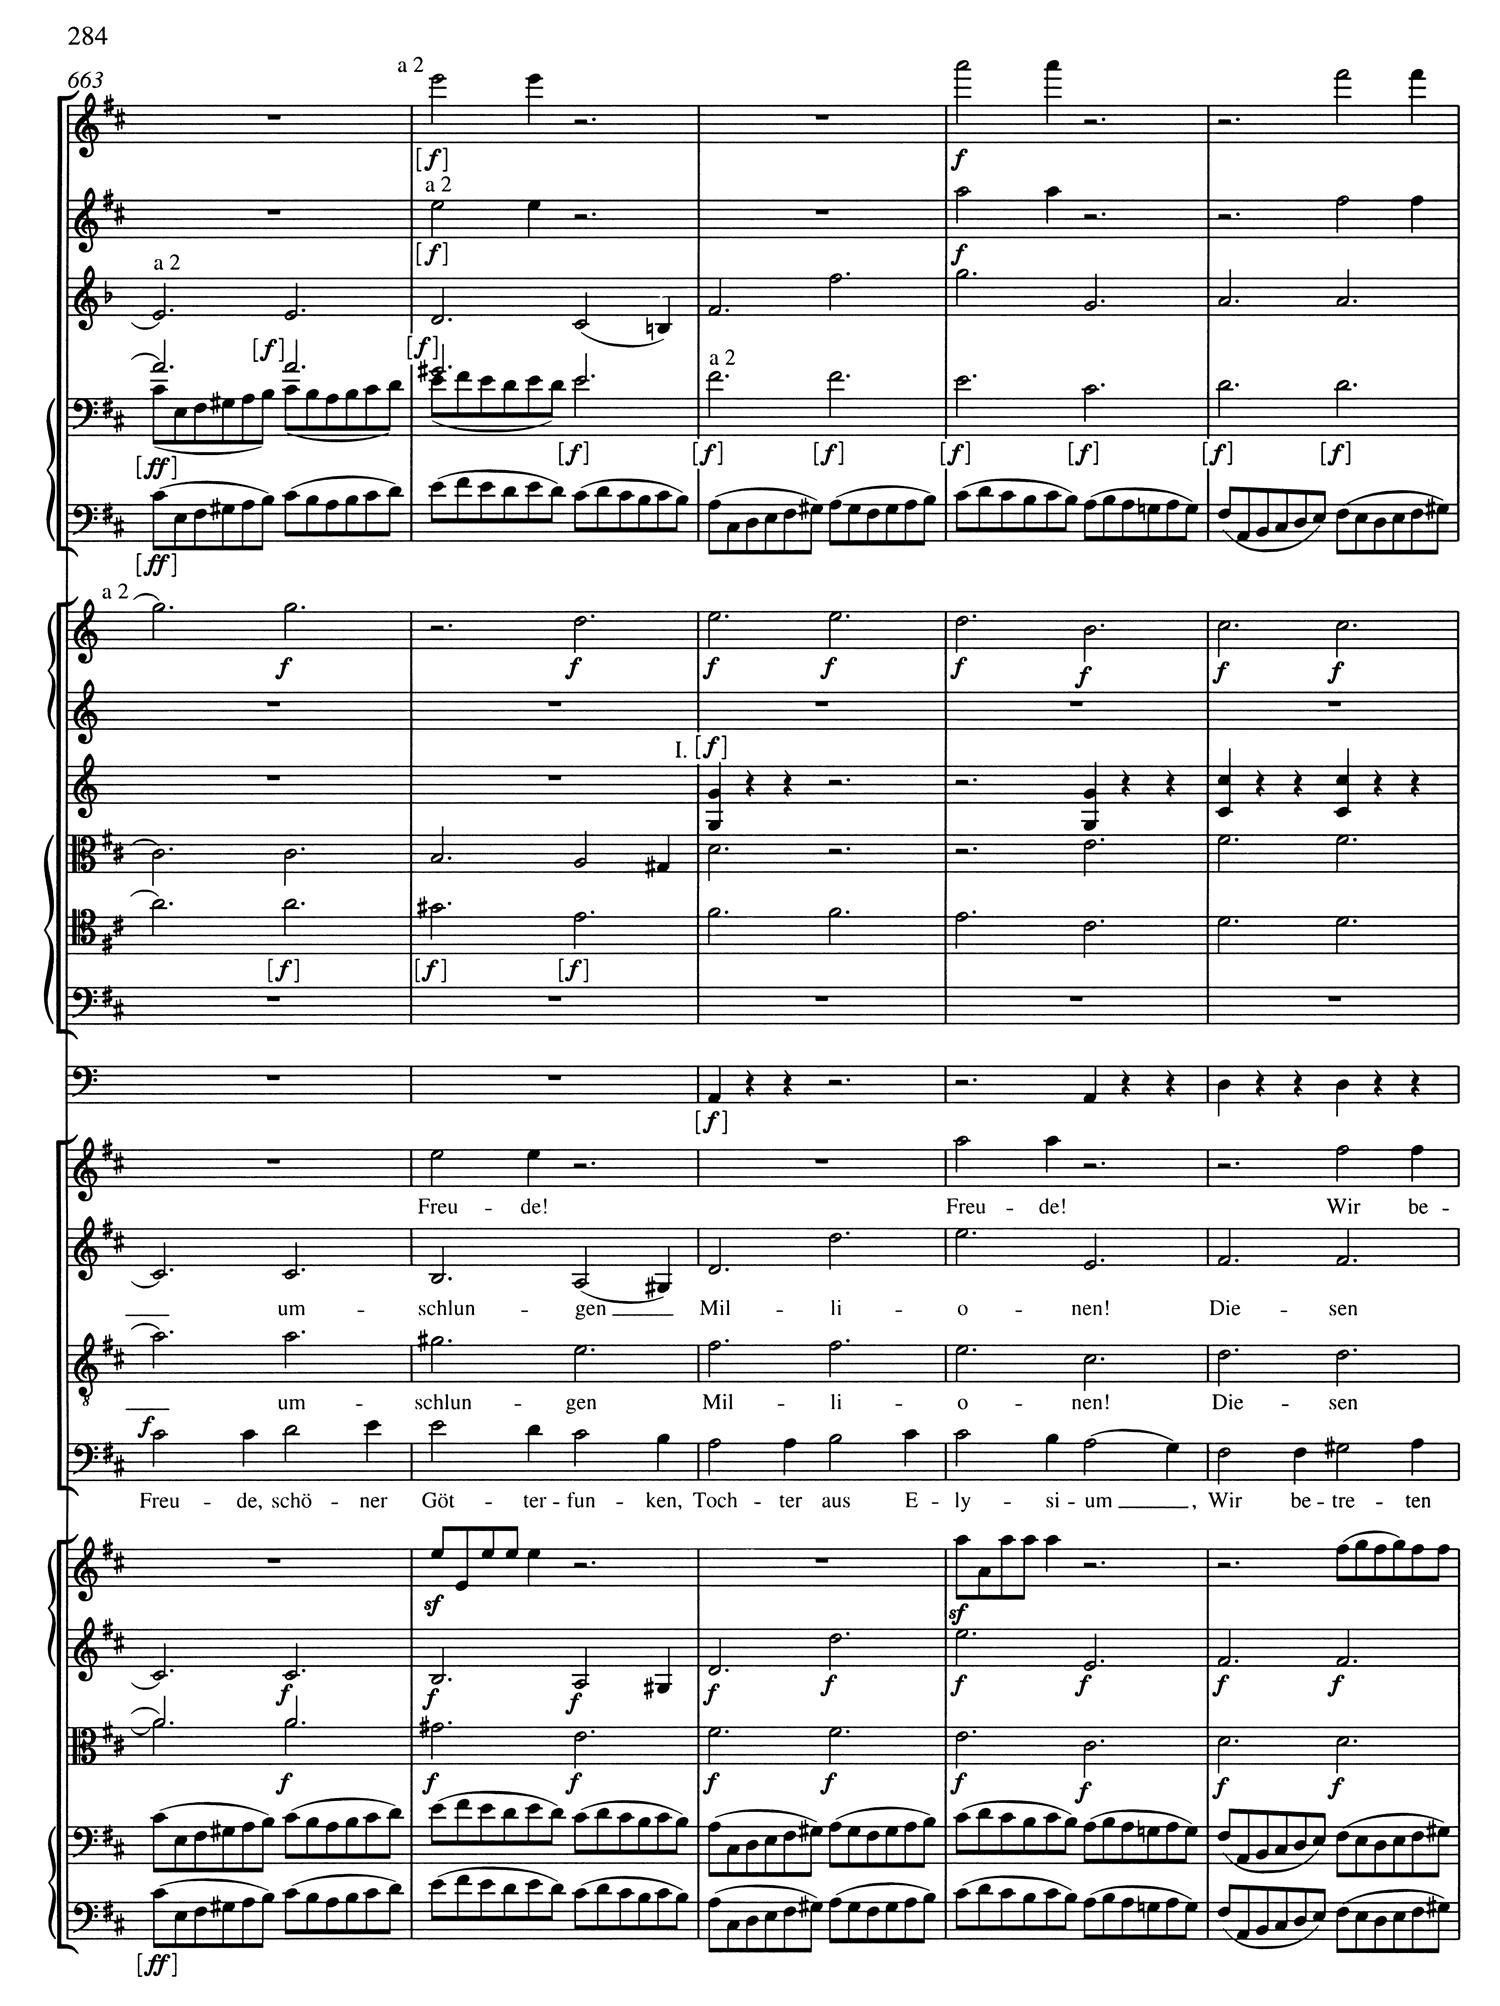 Beethoven 9 Contra Score 1.jpg